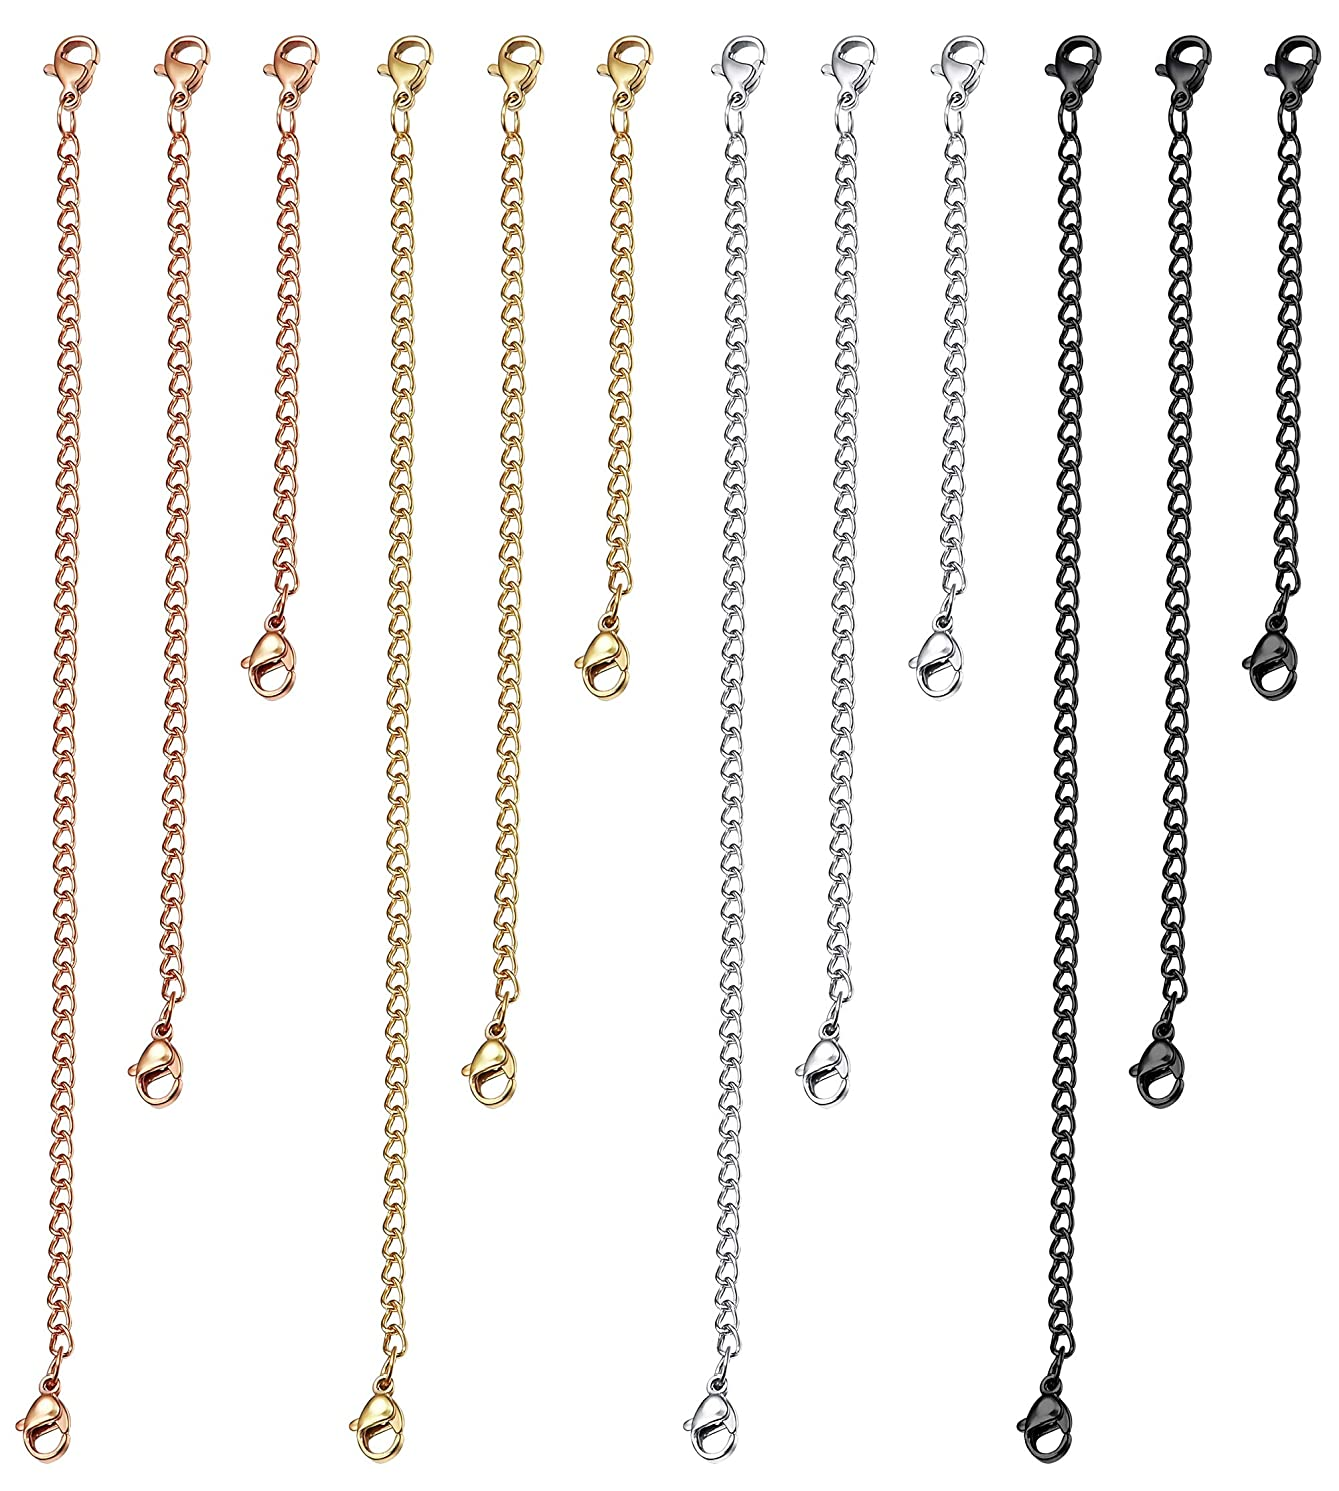 ORAZIO 5-10Pcs Stainless Steel Necklace Bracelet Extender Chain Set,2